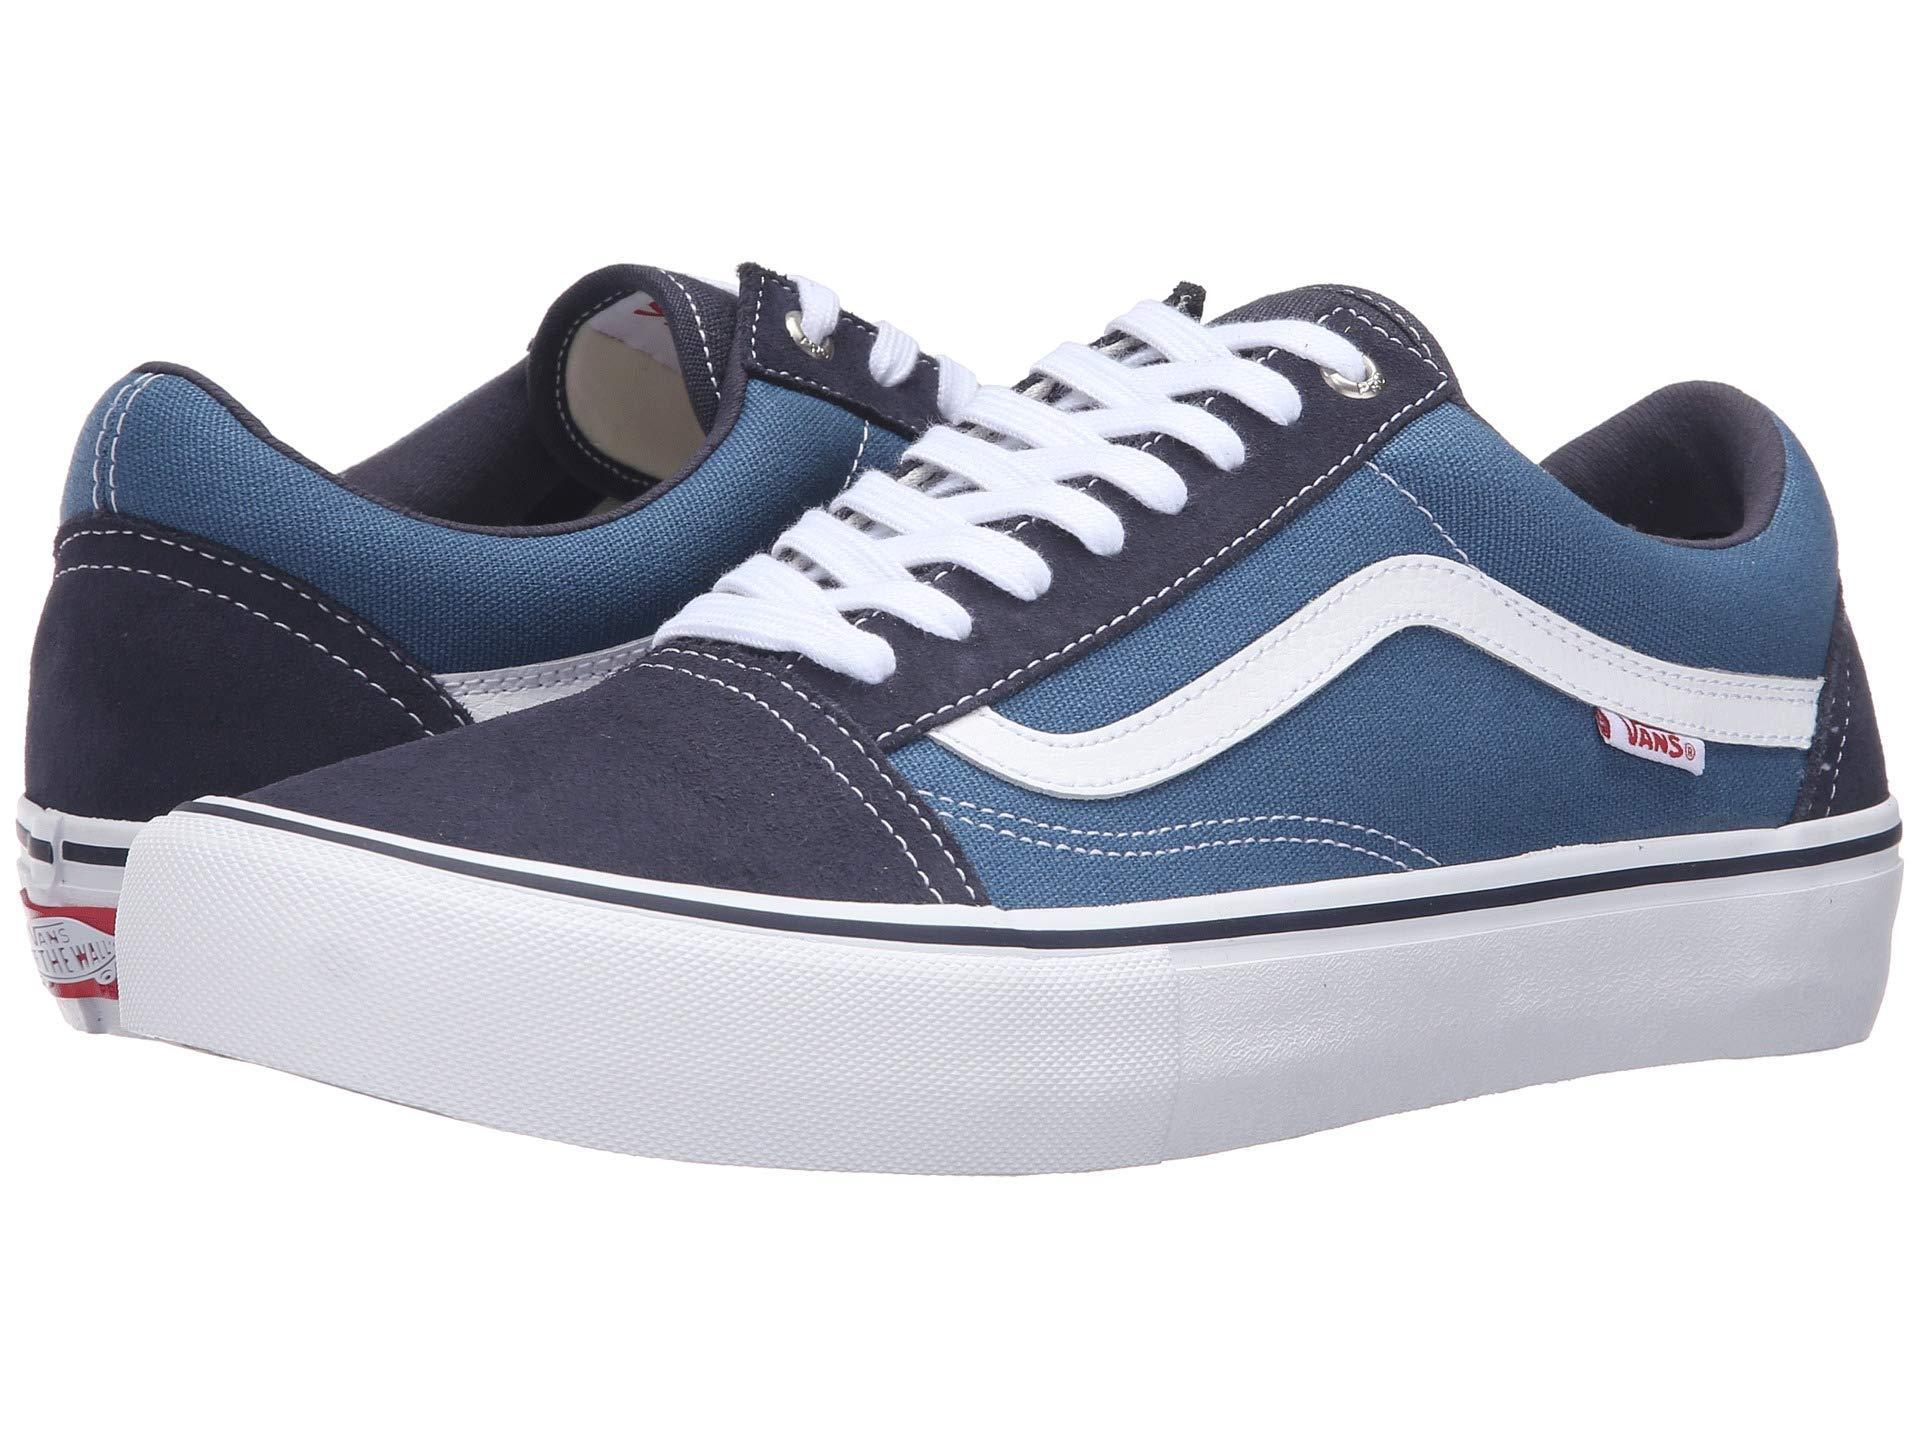 26dea698192 Vans. Blue Old Skool Pro ((ballistic) Marshmallow black) Men s Skate Shoes